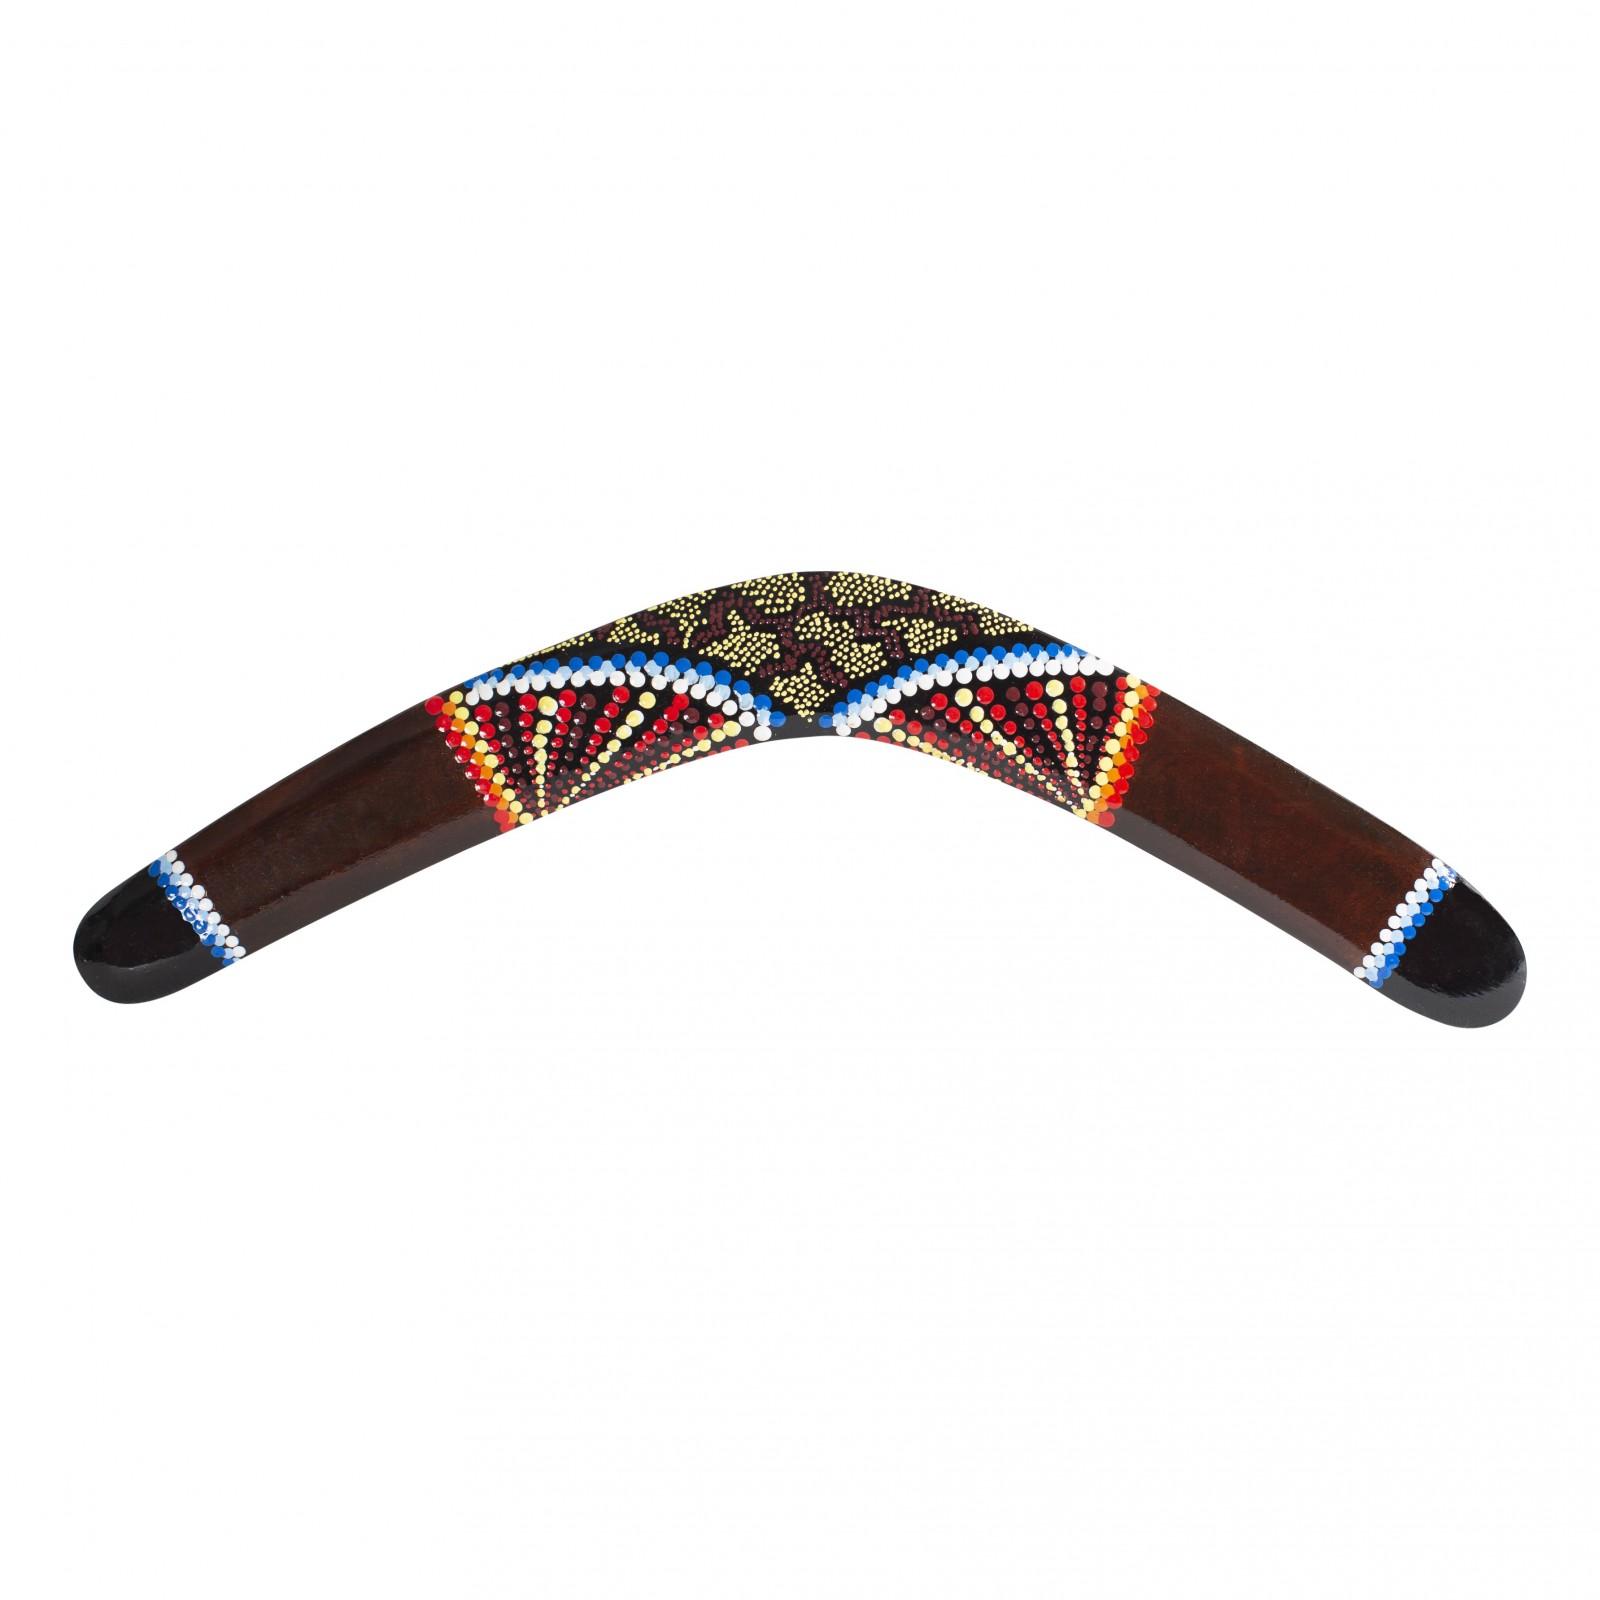 Australian Treasures boomerang 50cm (19.6'') wood kangaroo